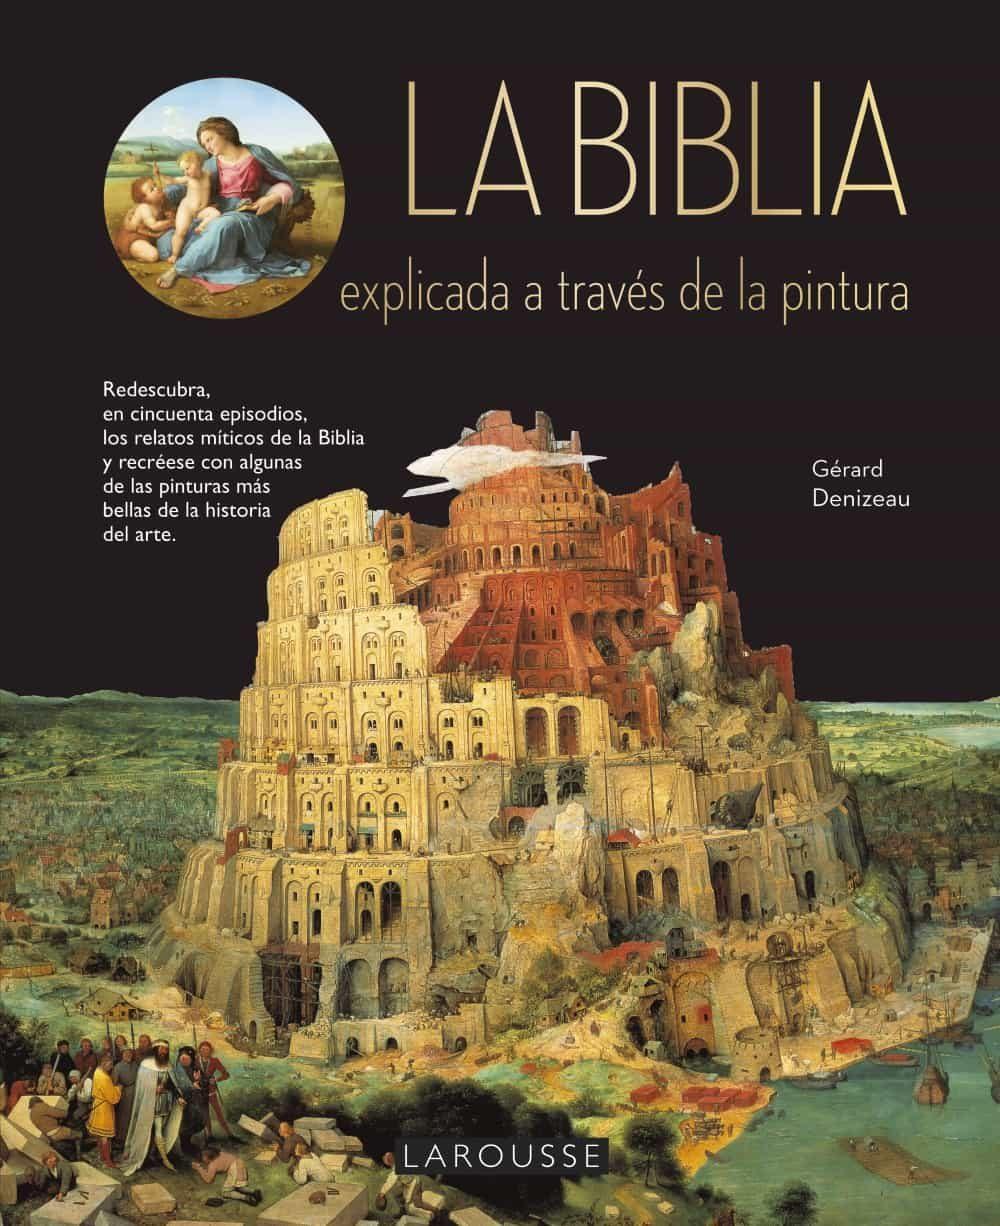 La Biblia Explicada A Traves De La Pintura - Denizeau Gerard